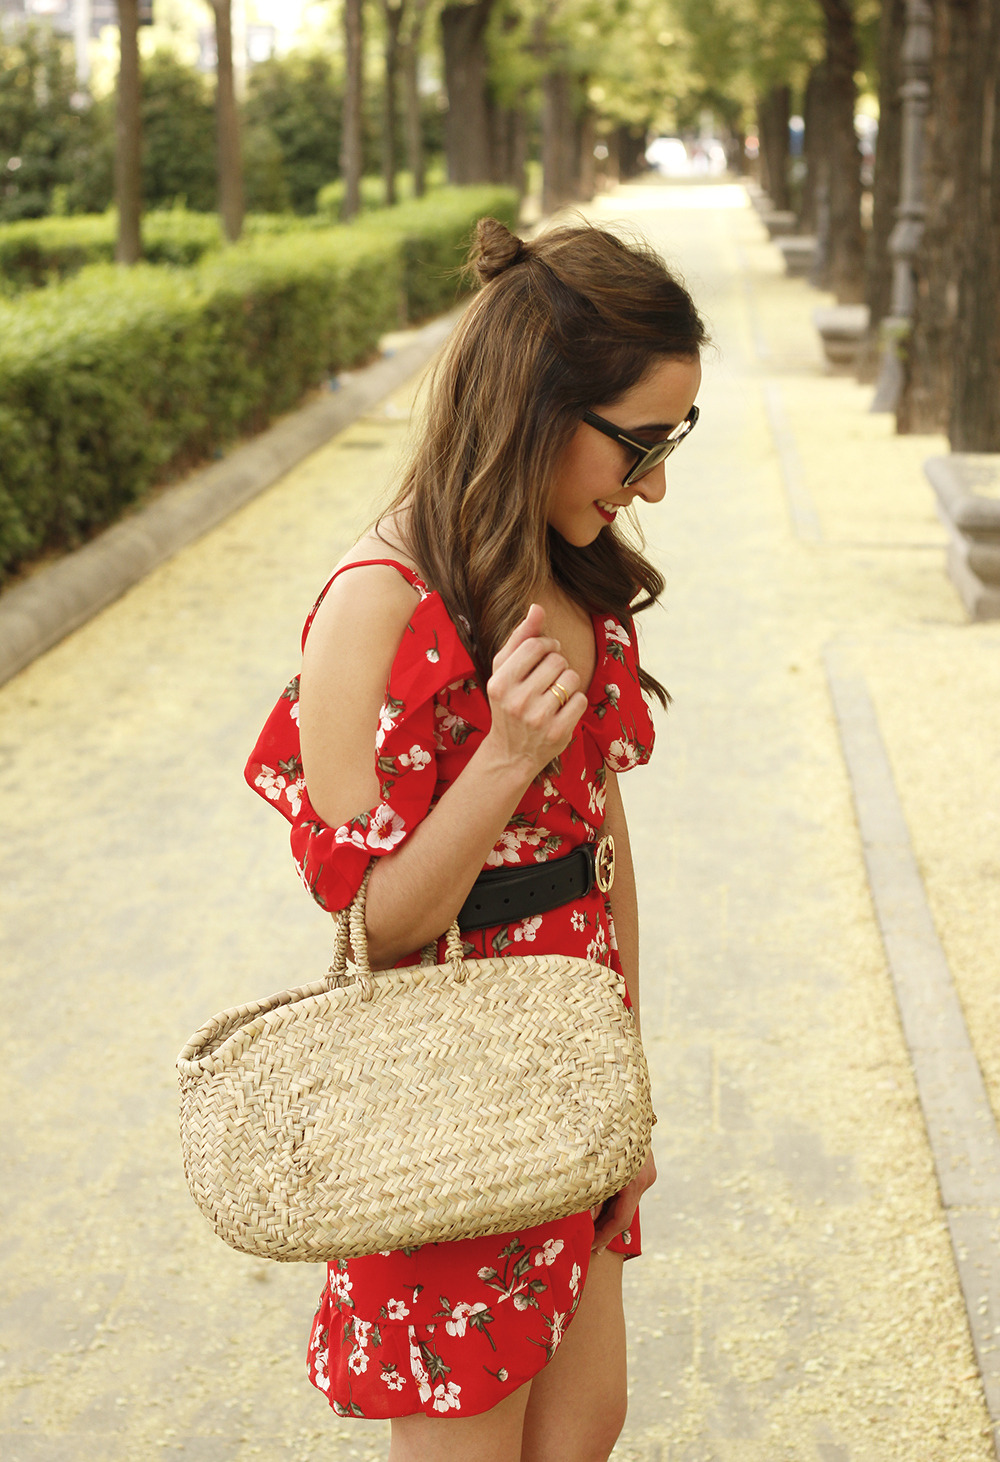 Red flower dress nude heels gucci belt rafia bag style fashion summer04